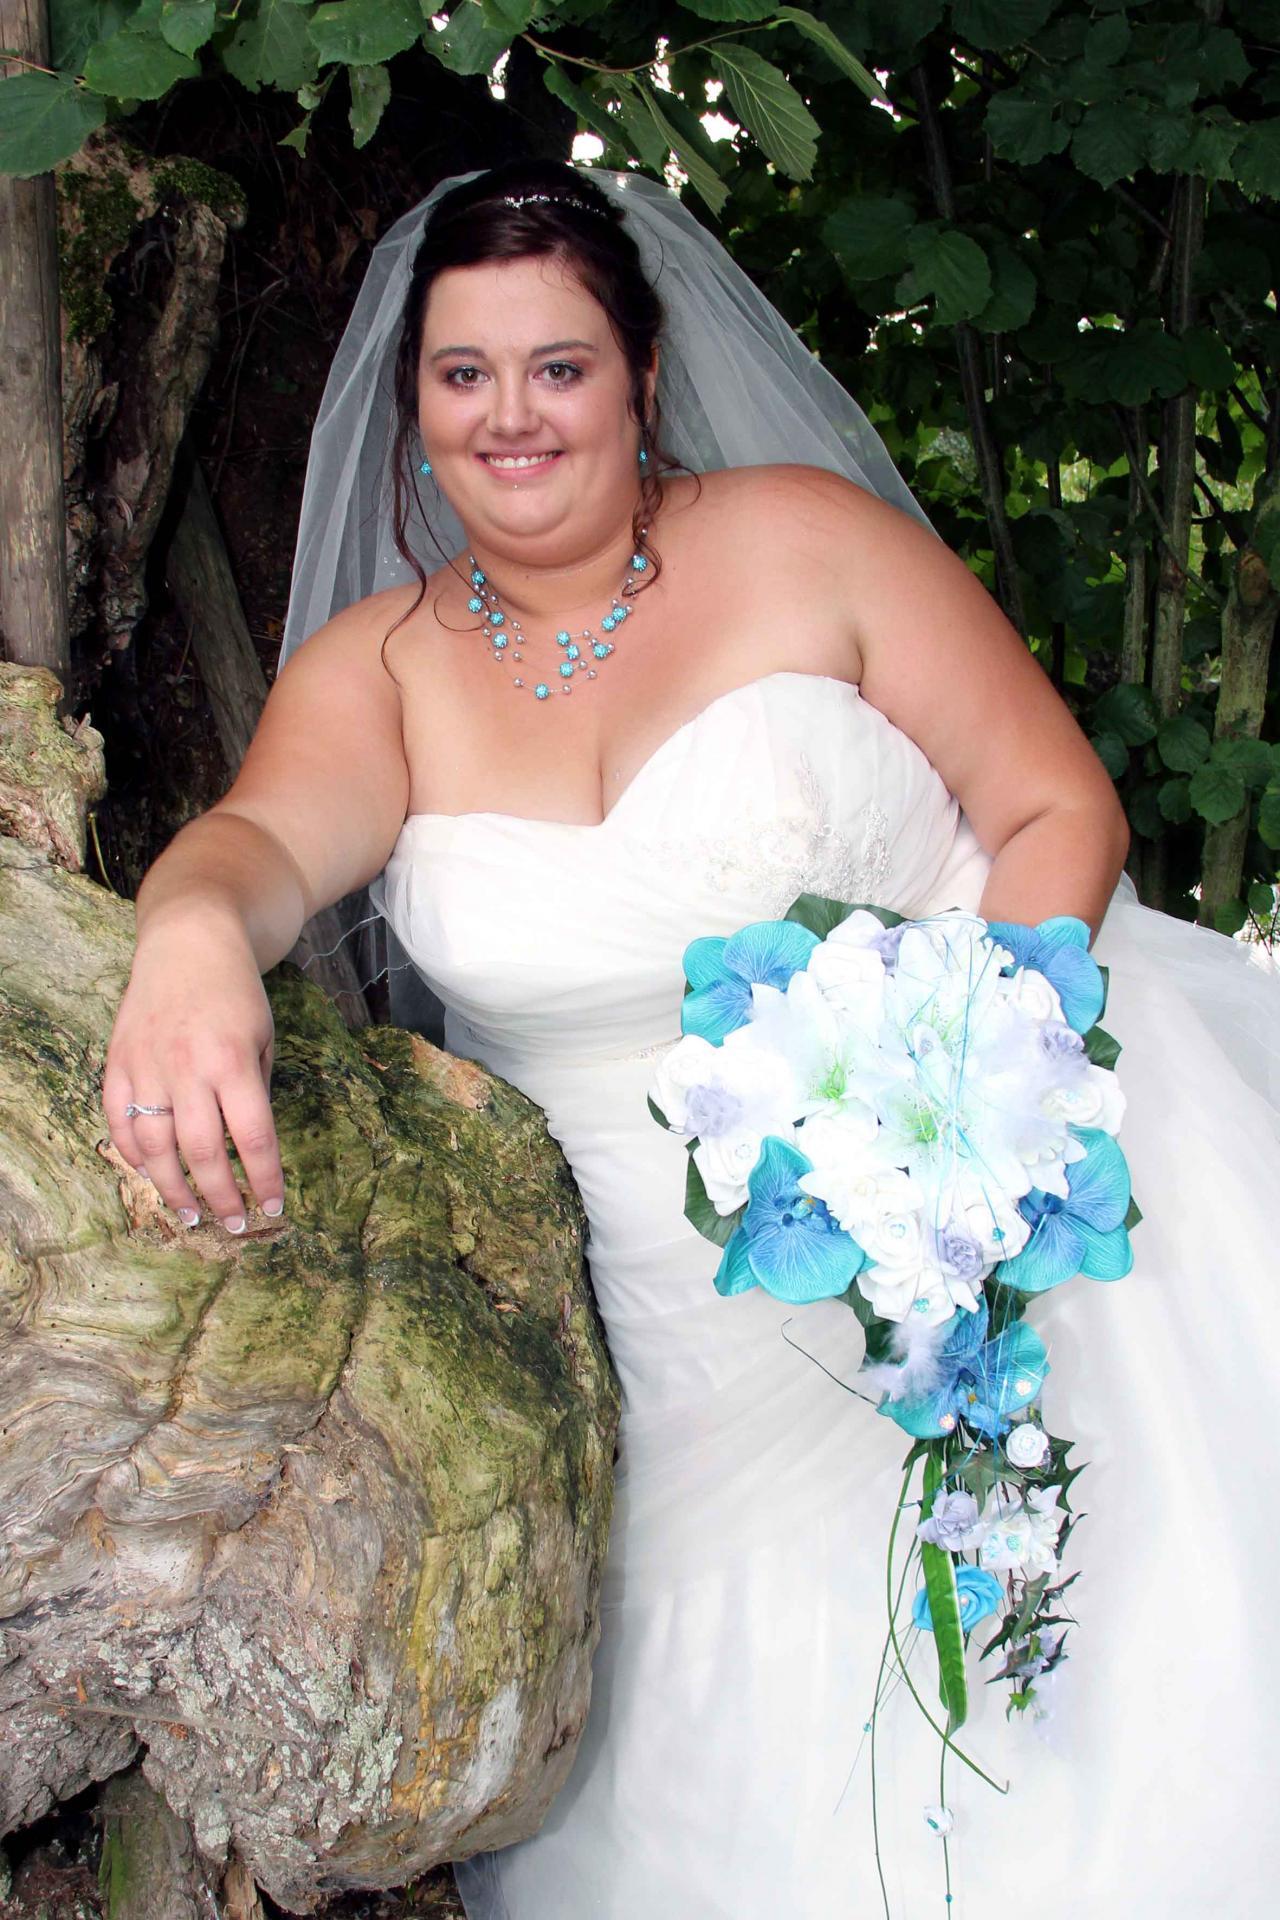 Joveniaux photographe de mariage avesnes sur helpe nord